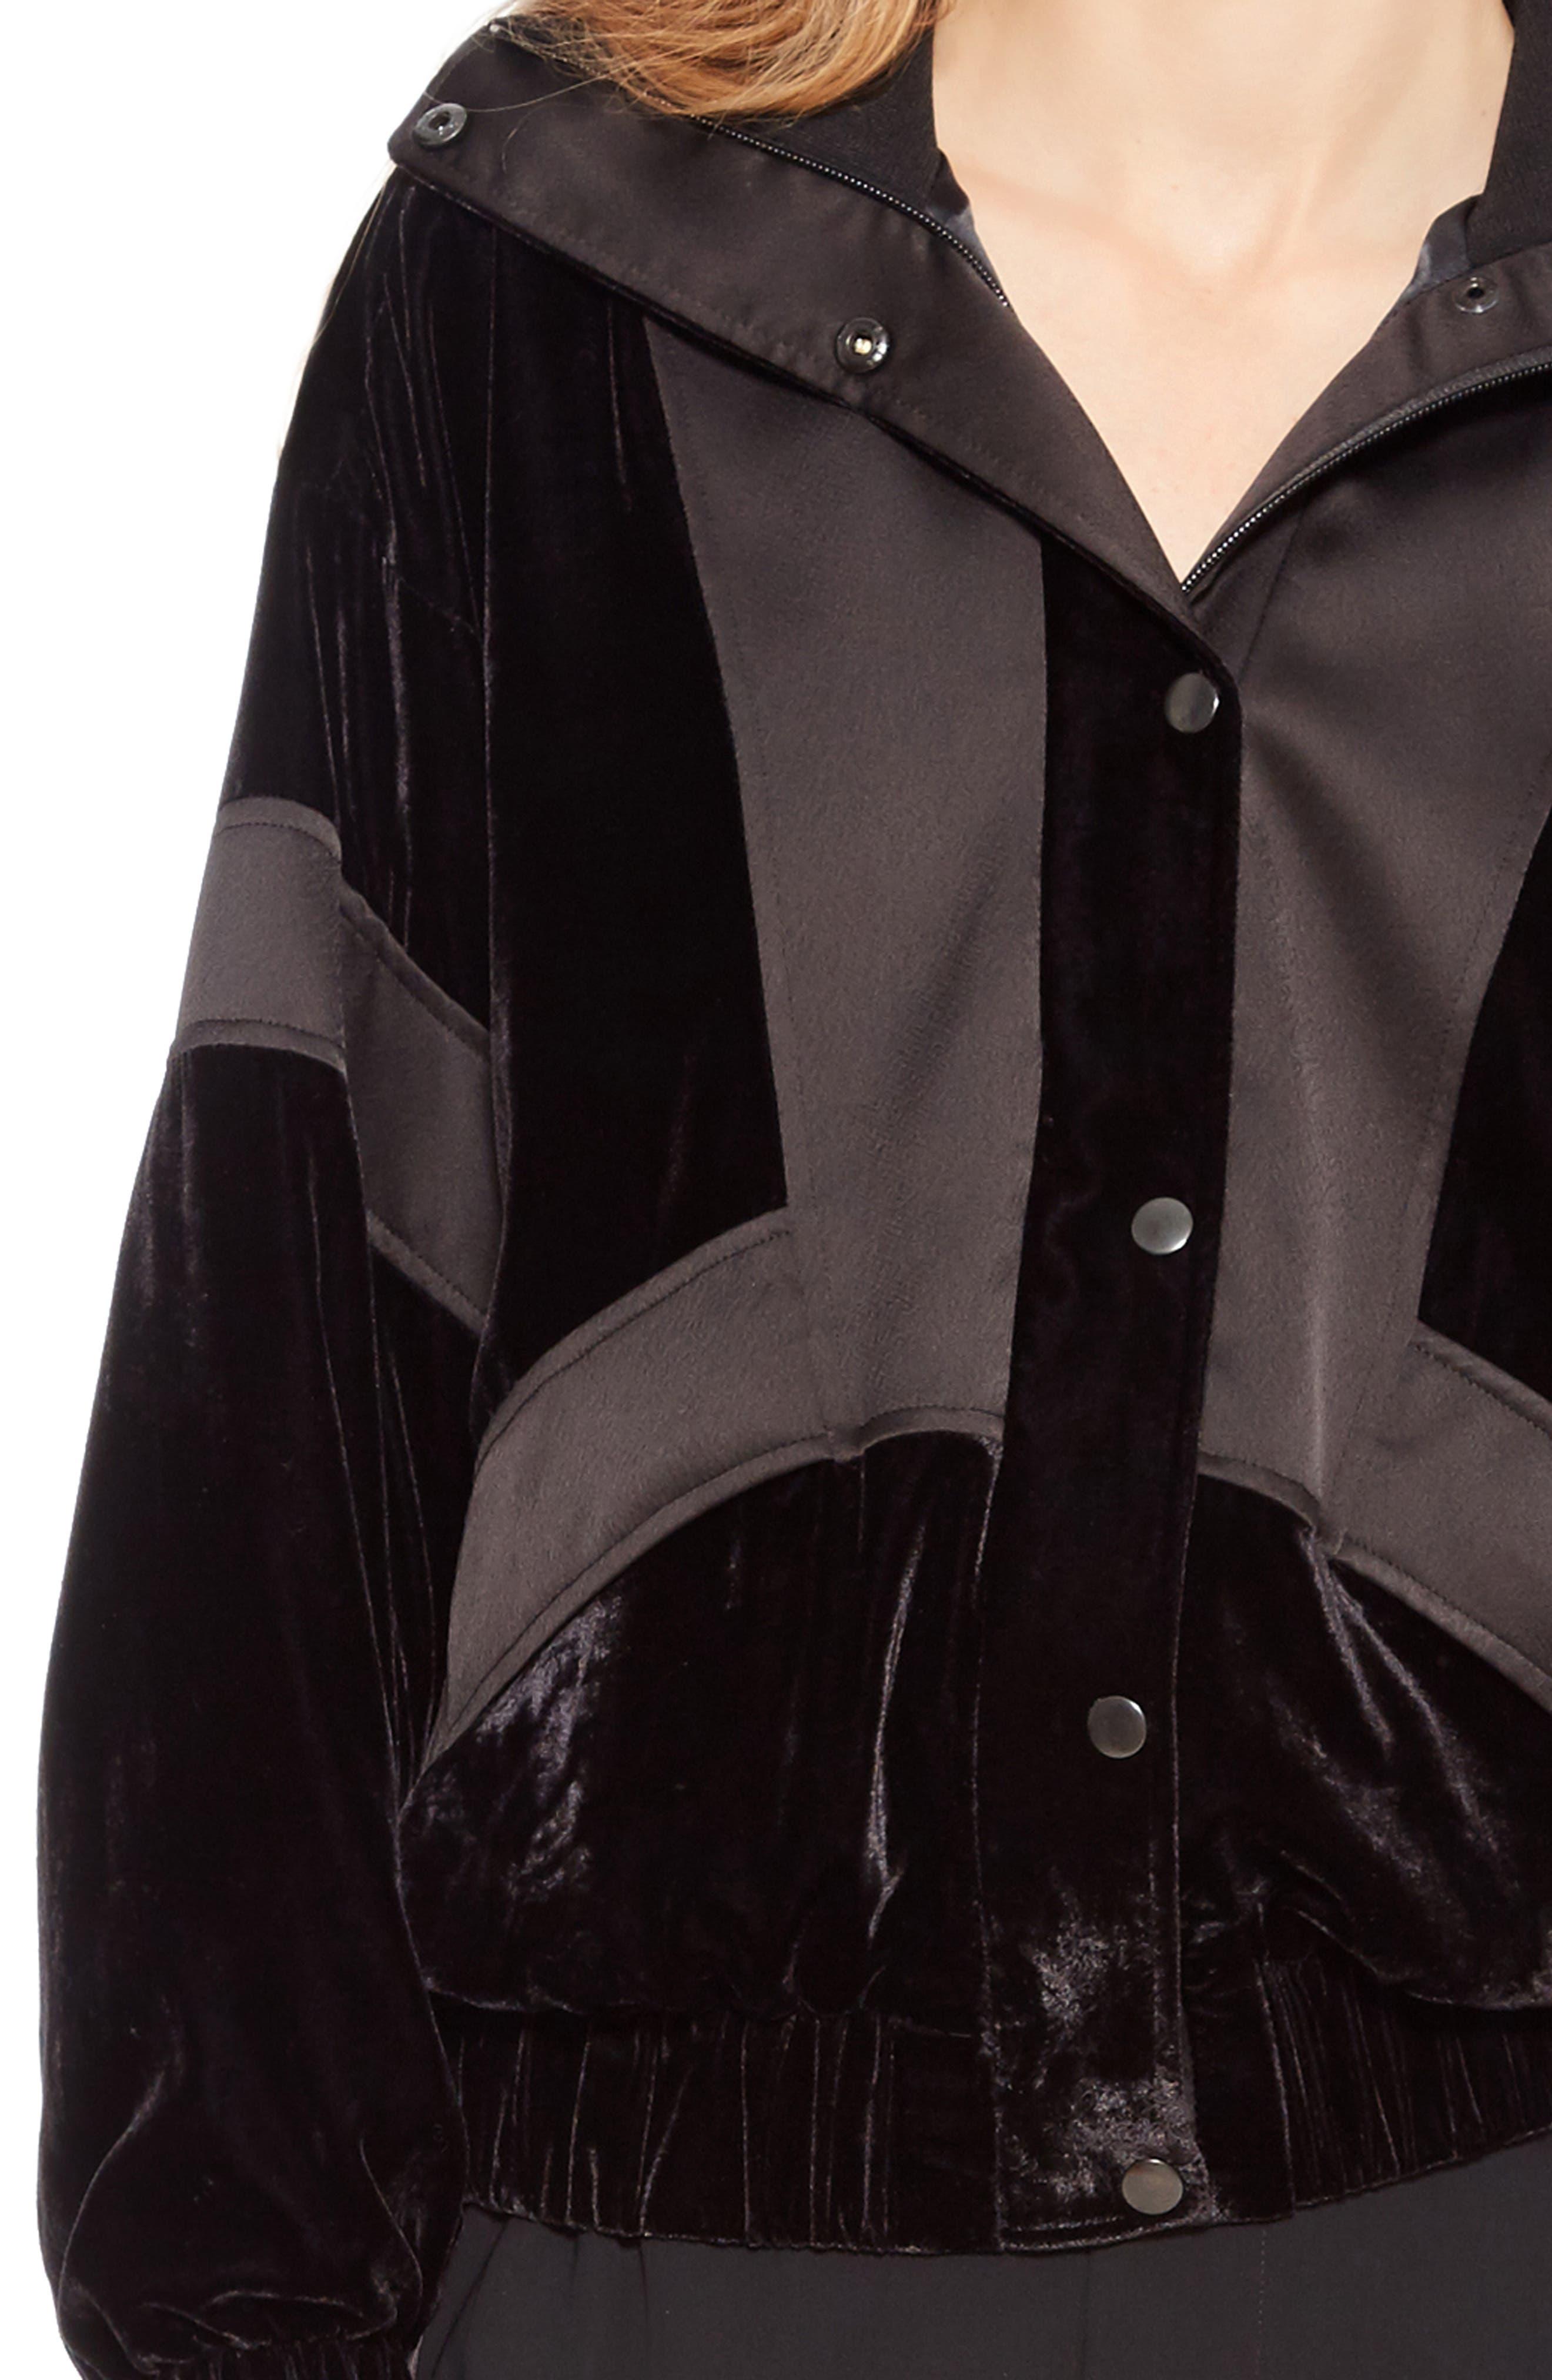 Hollis Jacket,                             Alternate thumbnail 4, color,                             BLACK